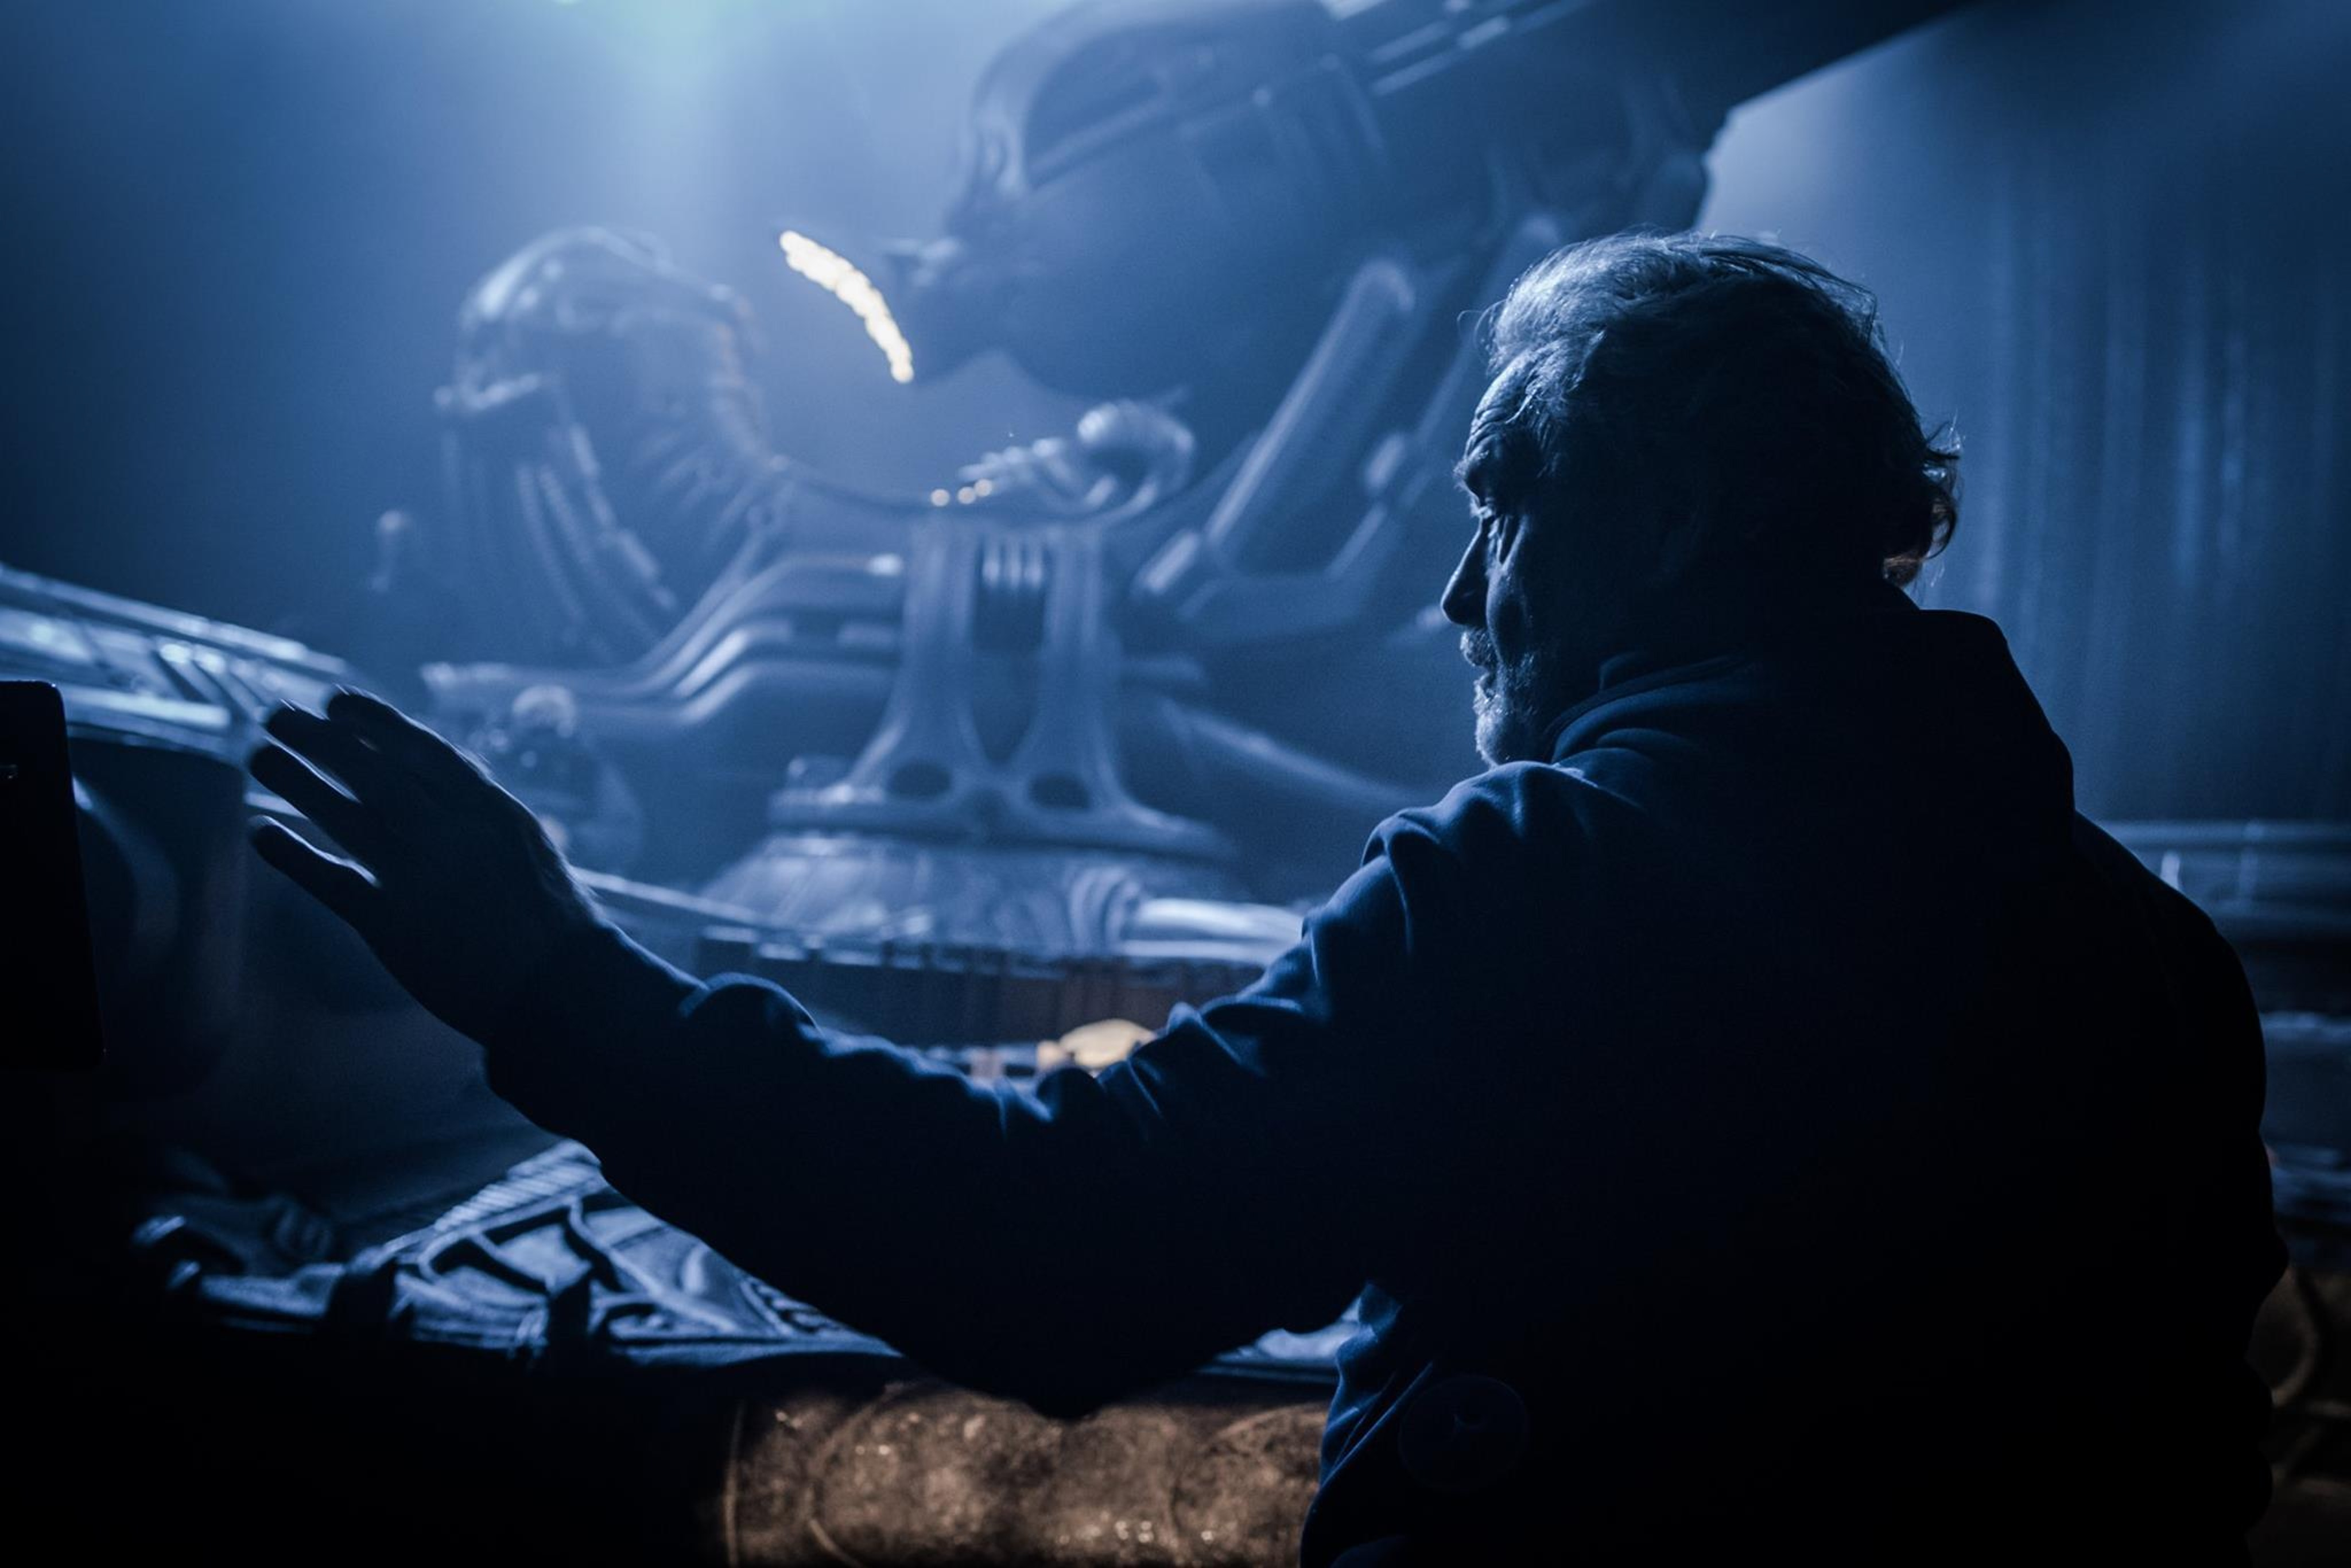 The Space Jockey in 'Alien: Covenant'.